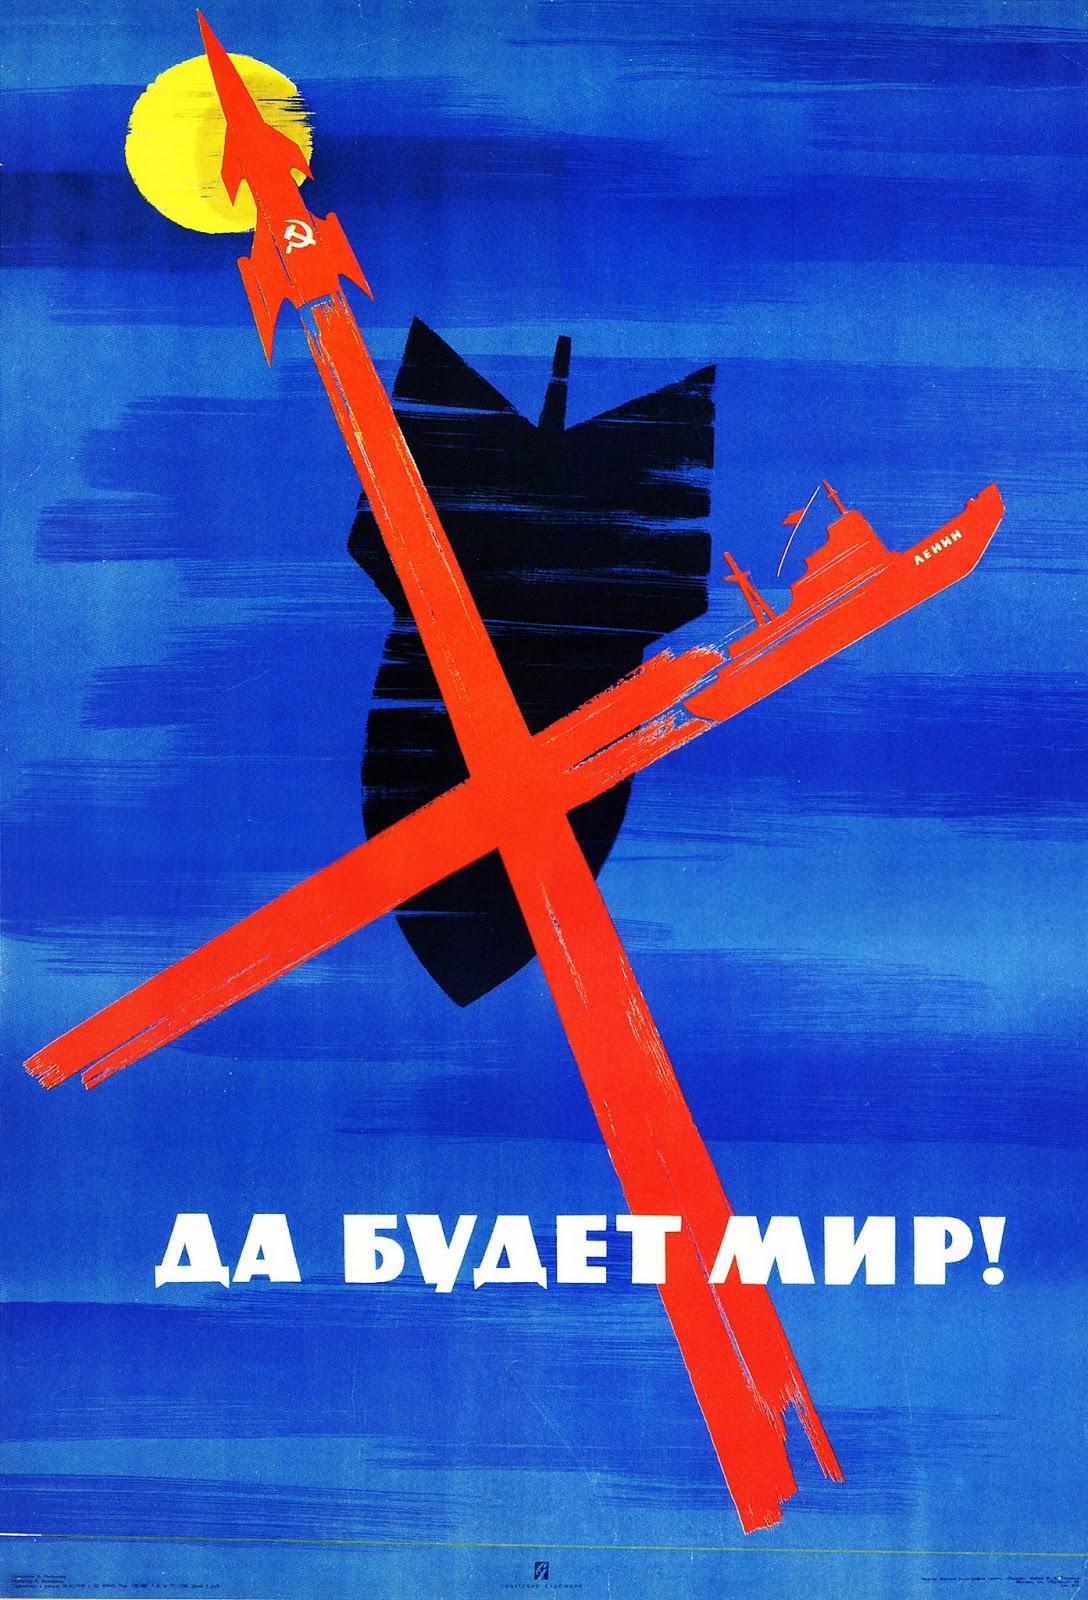 soviet space program name - photo #26